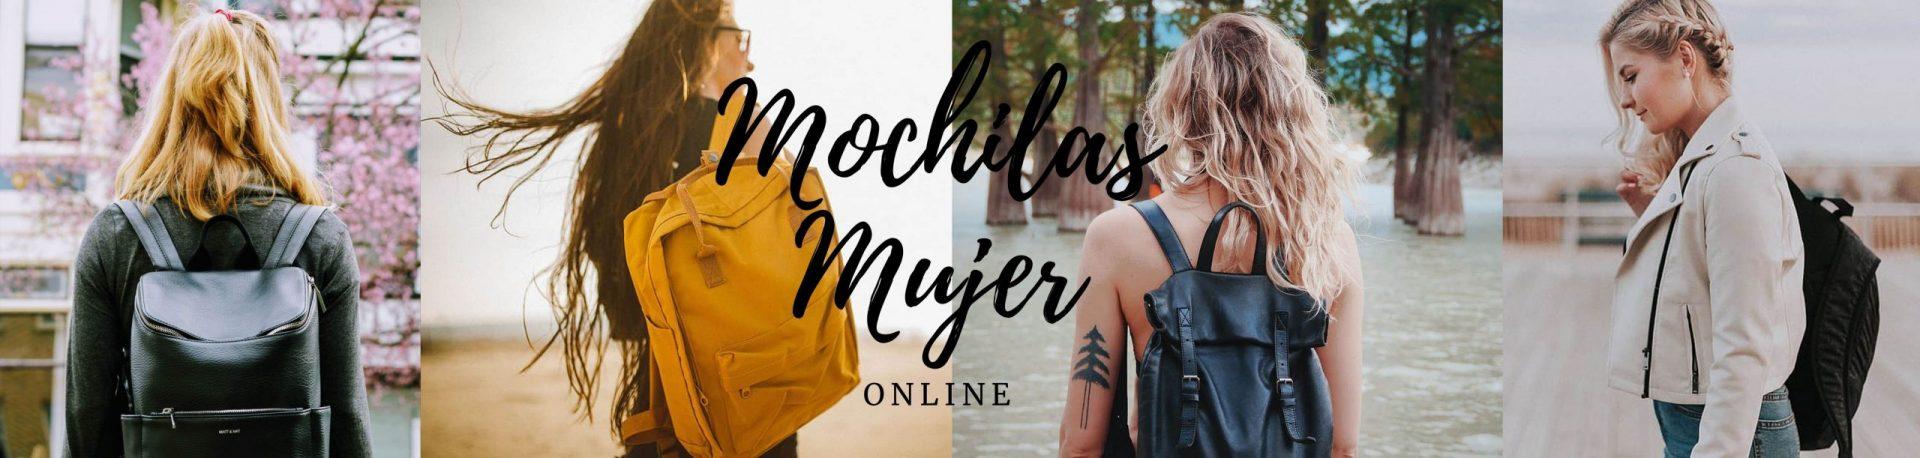 Mochilas Mujer